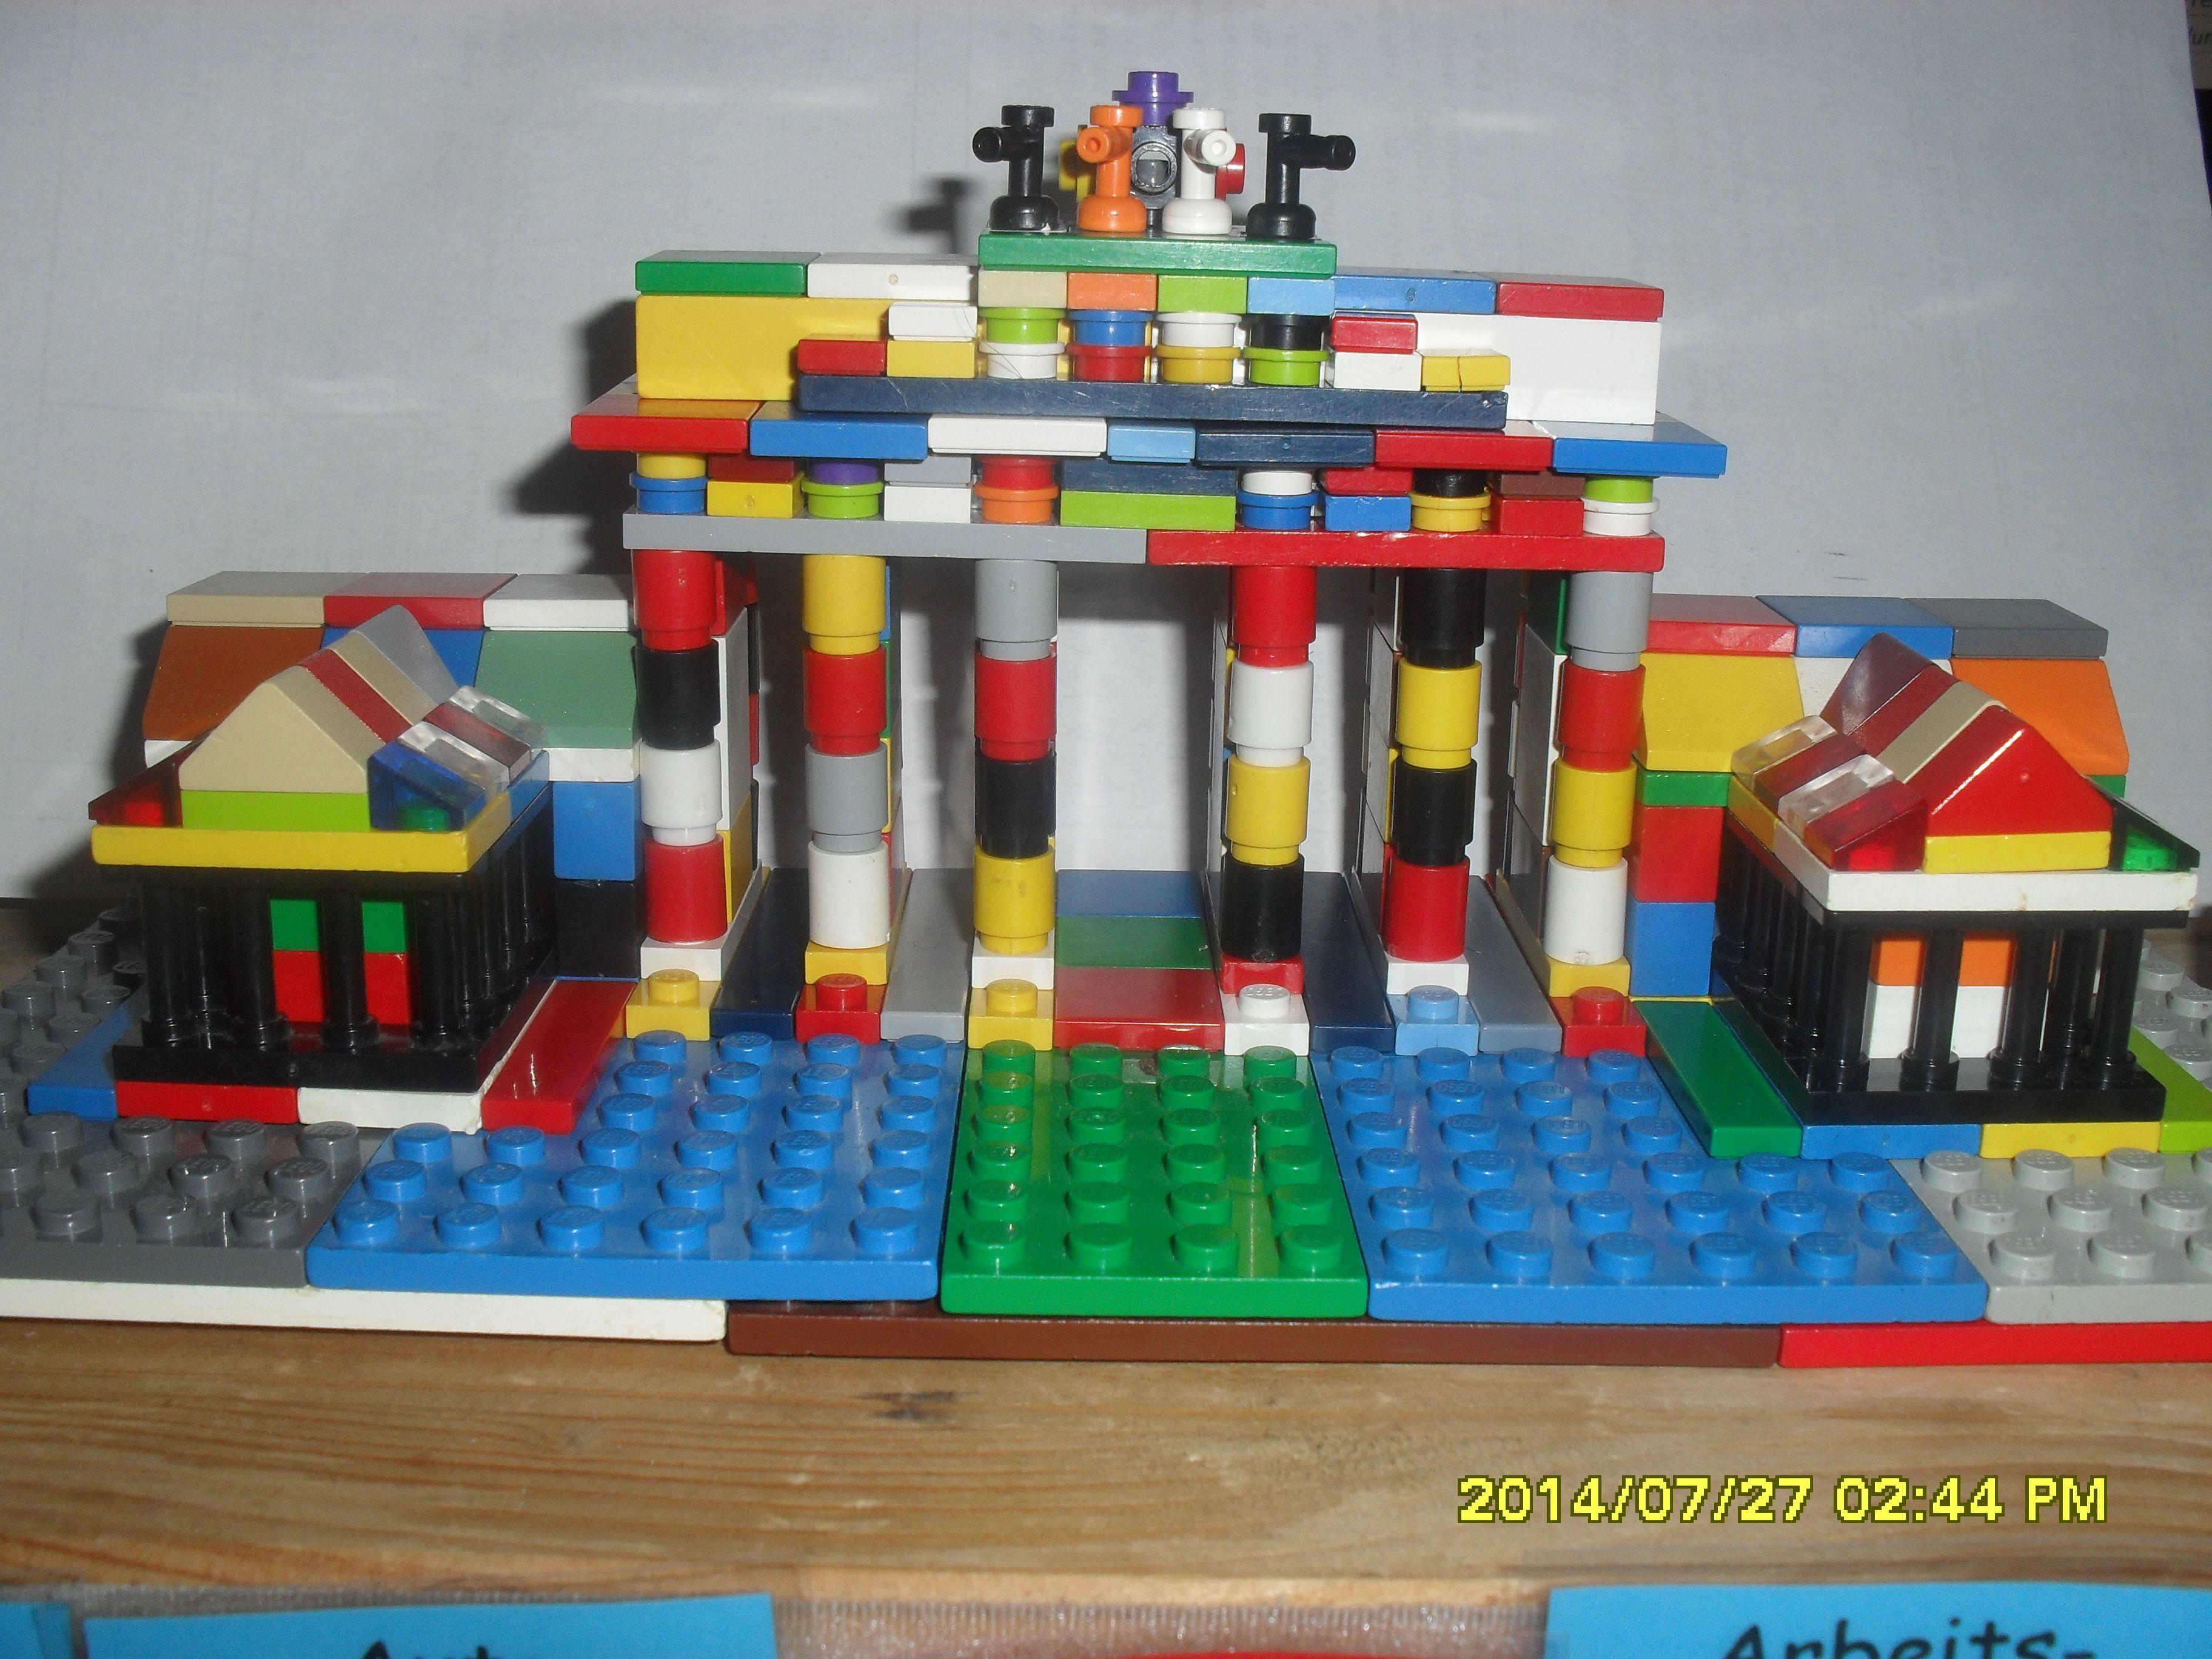 Lego Brandenburger Tor Lego Brandenburger Tor Ich Bin Nicht Perfekt